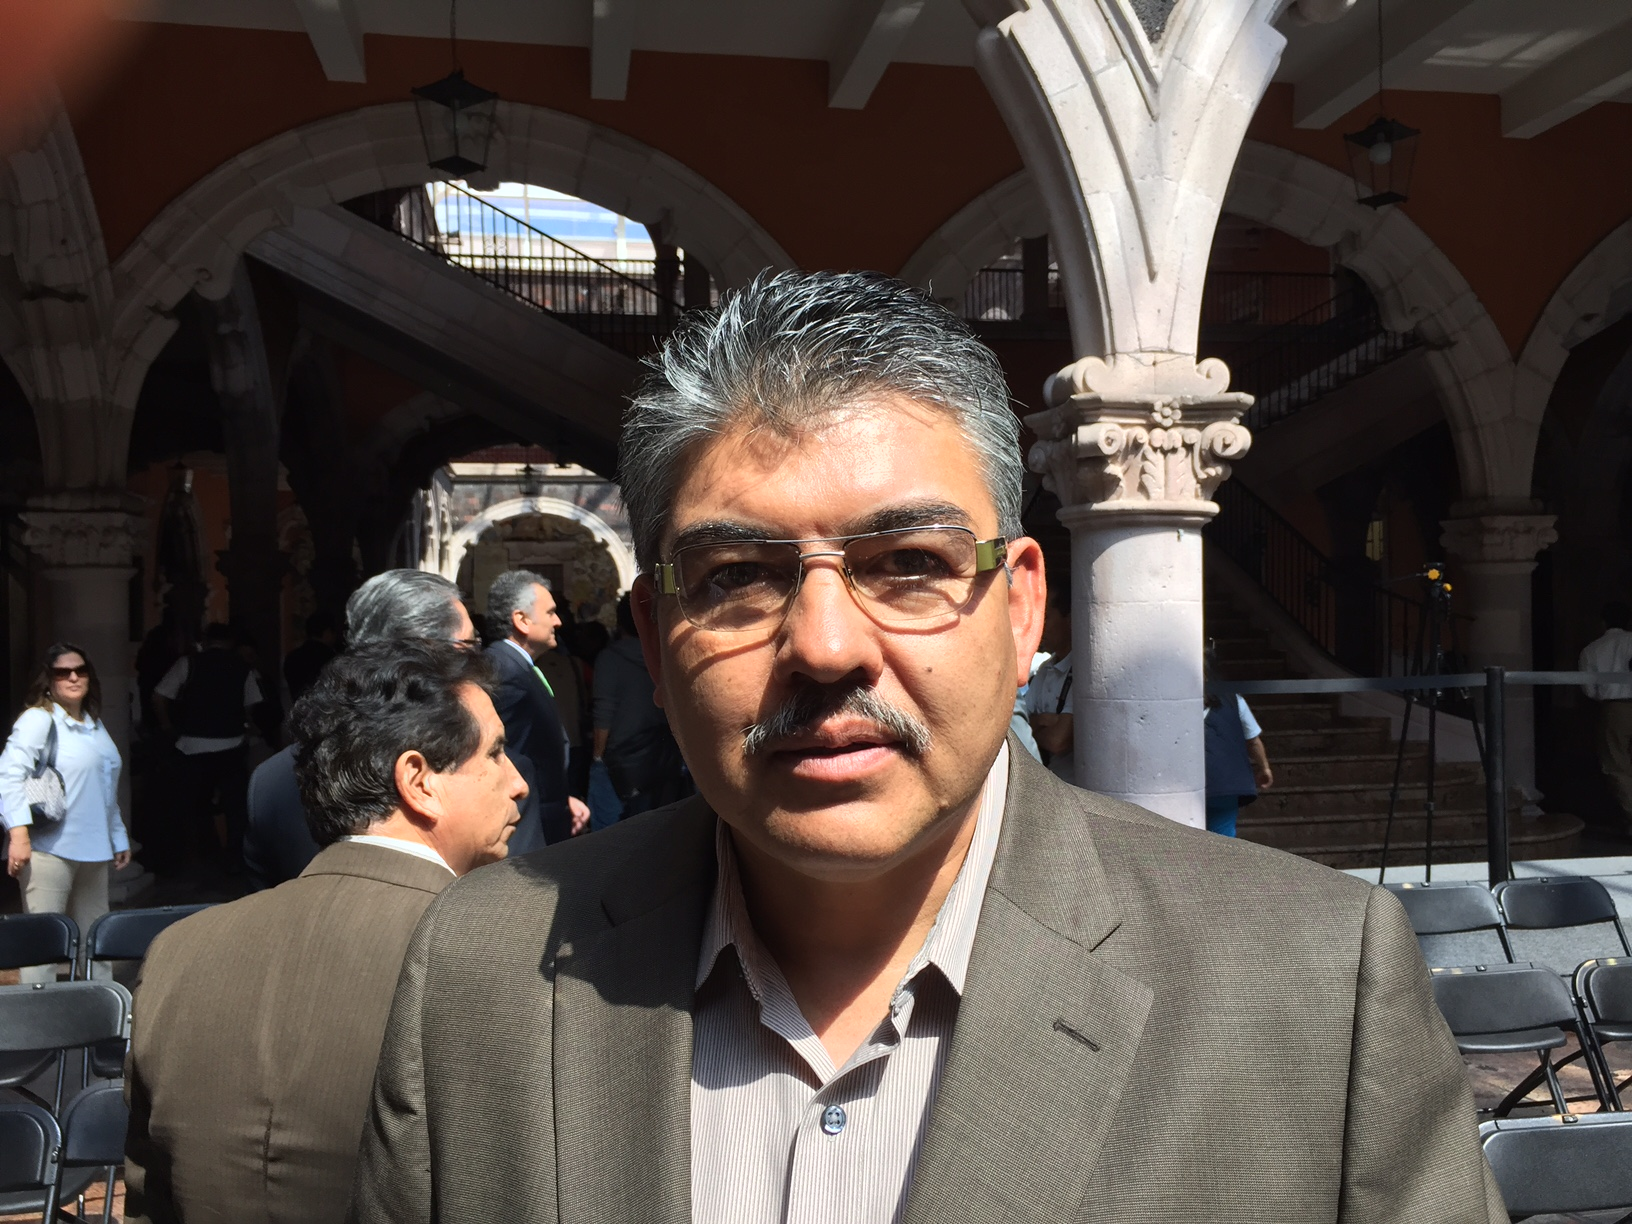 Alcalde de Tepezalá, Aguascalientes miente e incumple con la Ley